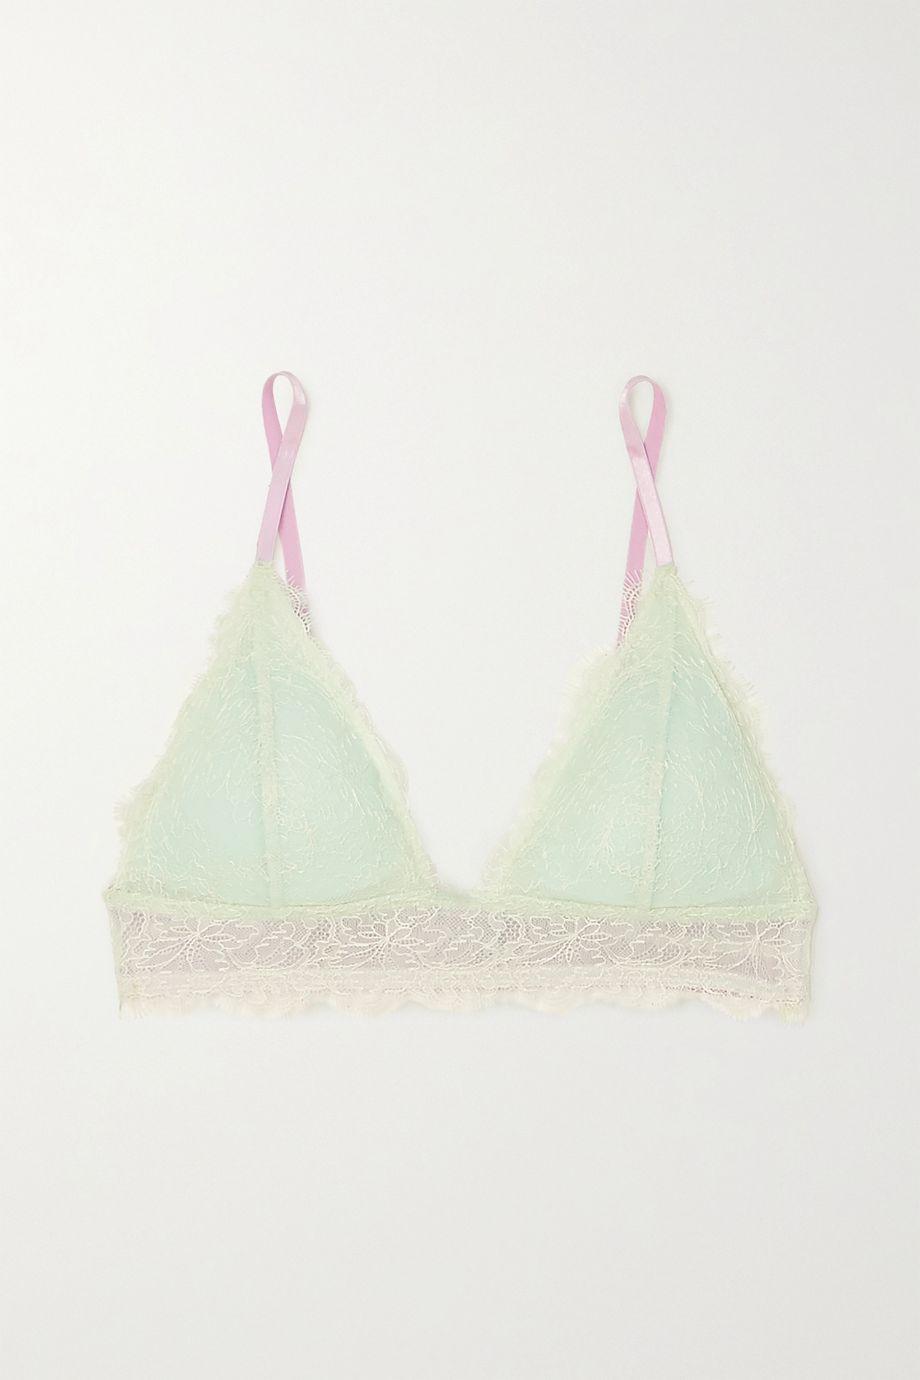 Dora Larsen Marlowe stretch-lace soft-cup triangle bra